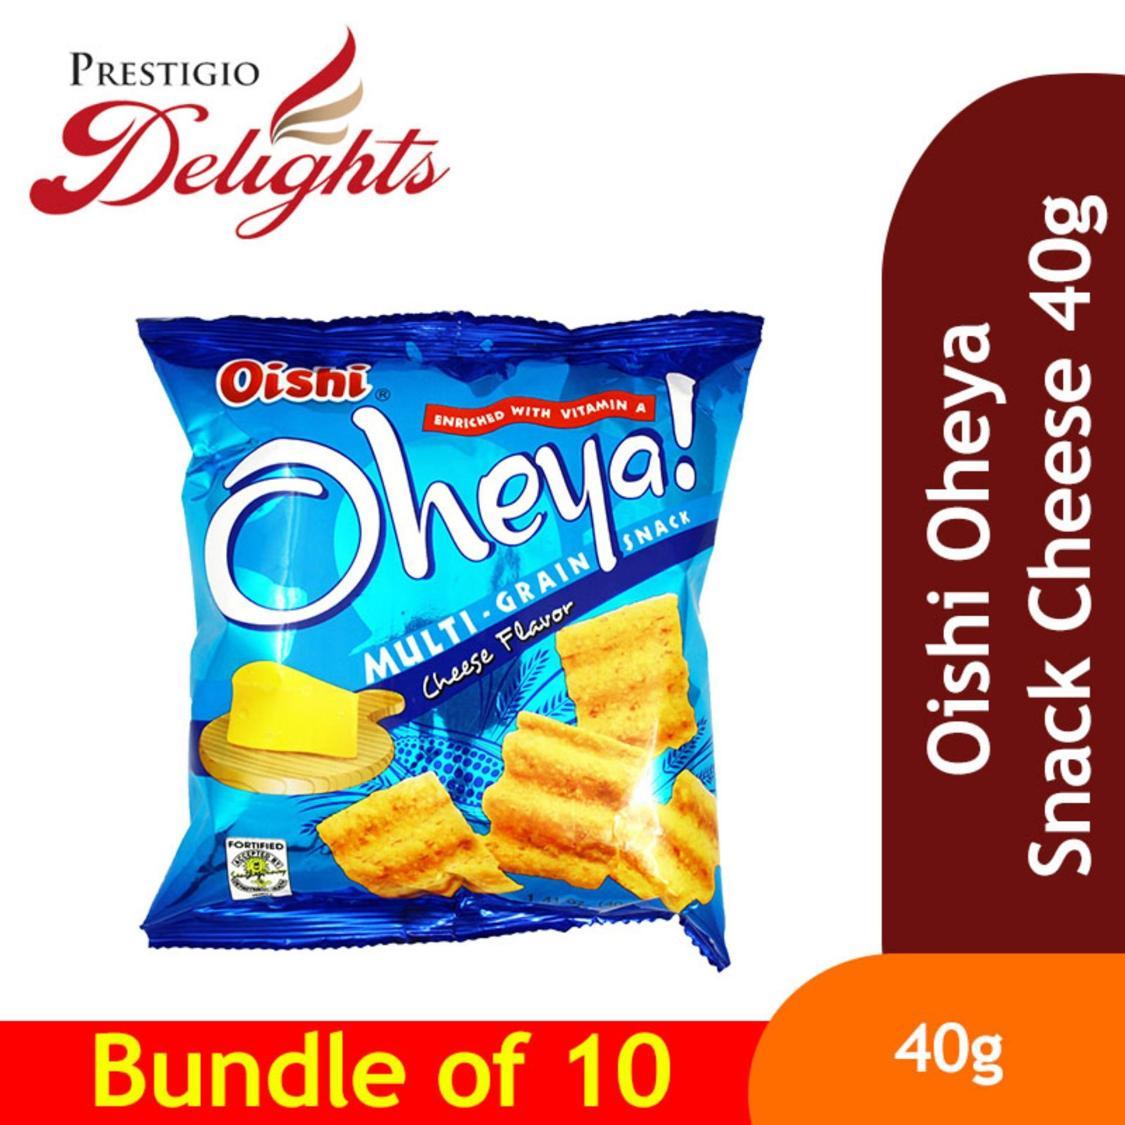 Oishi Oheya Snack Cheese 40g Bundle Of 10 By Prestigio Delights.